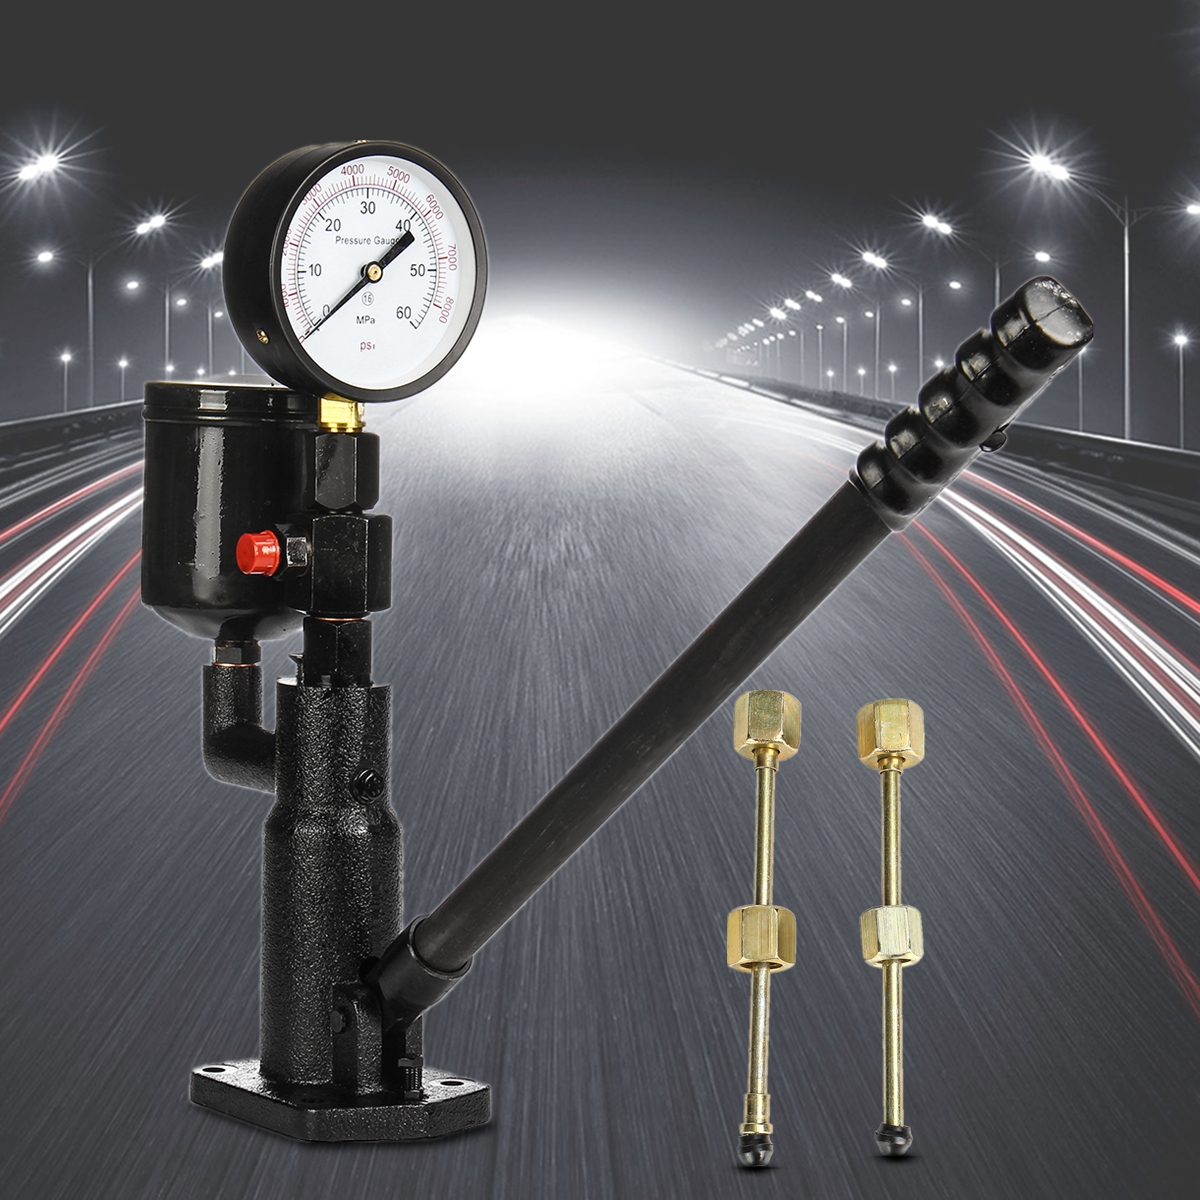 Bar/PSI 0-60Mpa Steel 1L Pop Diesel/Injector Nozzle Pressure Tester Dual Scale Read Gauge Black High Pressure Pipe Diagnostic цены